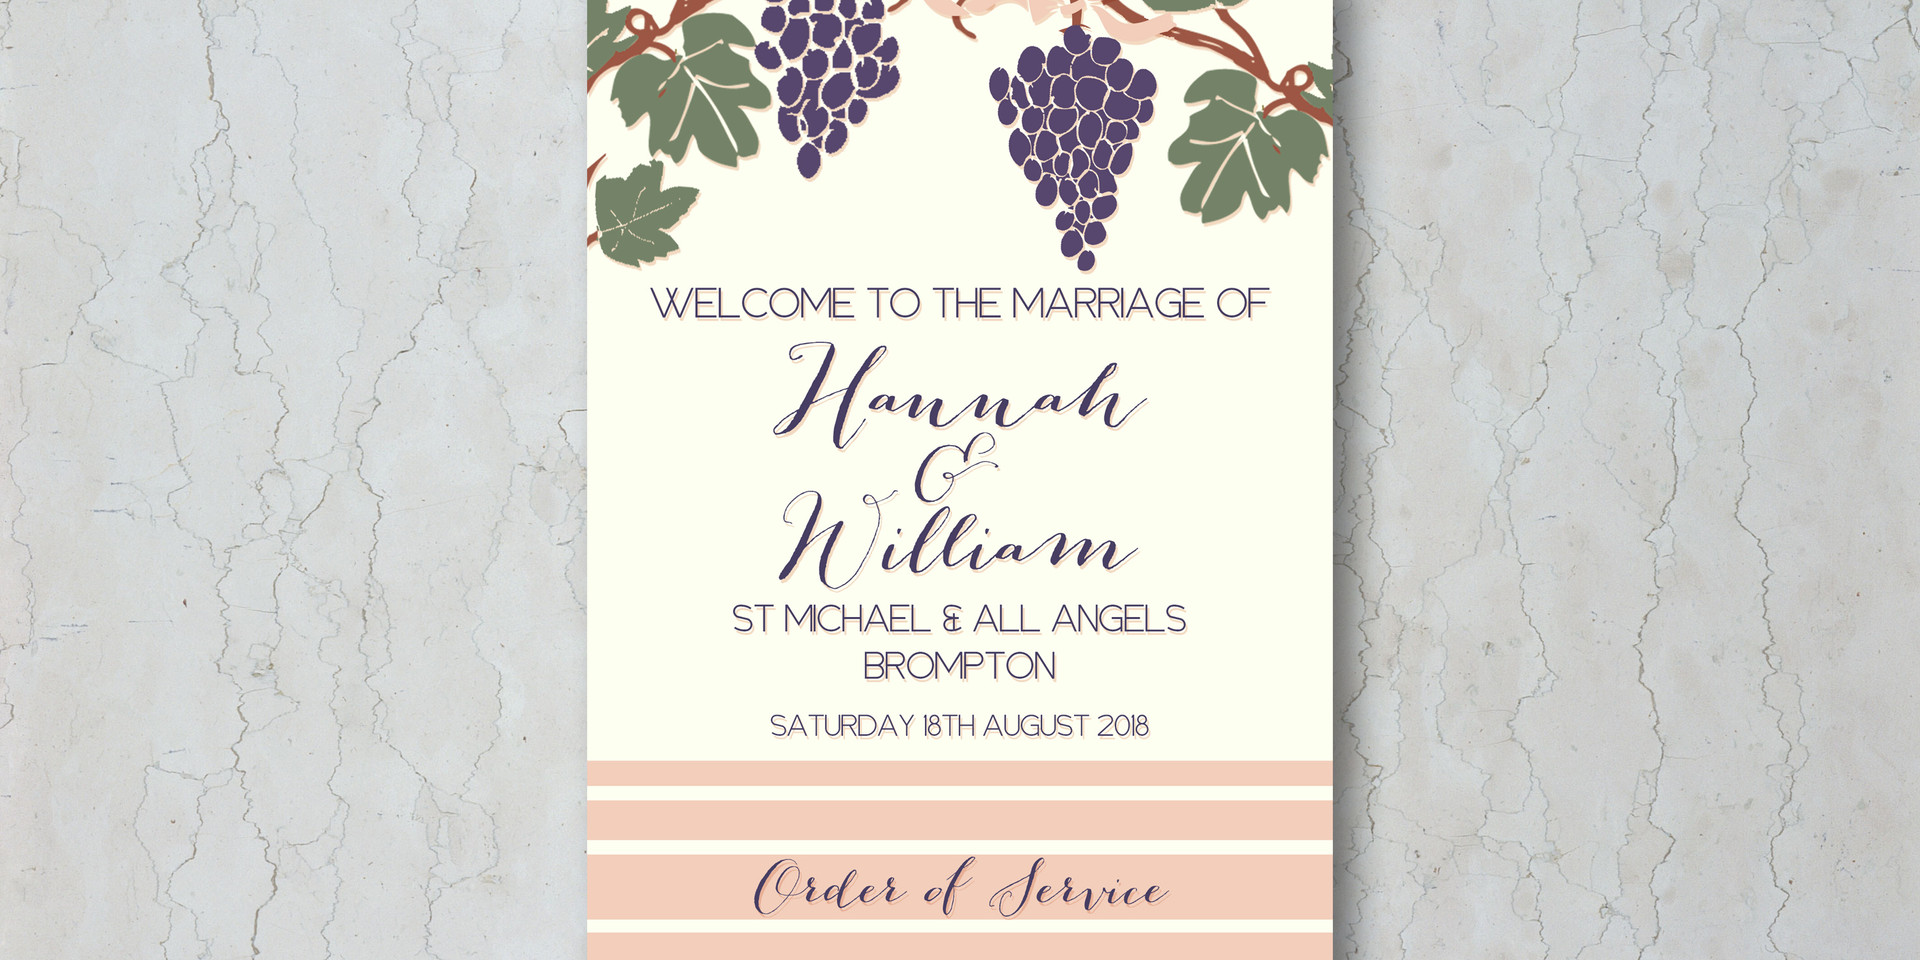 Grapes & Vines Wedding Order of Service